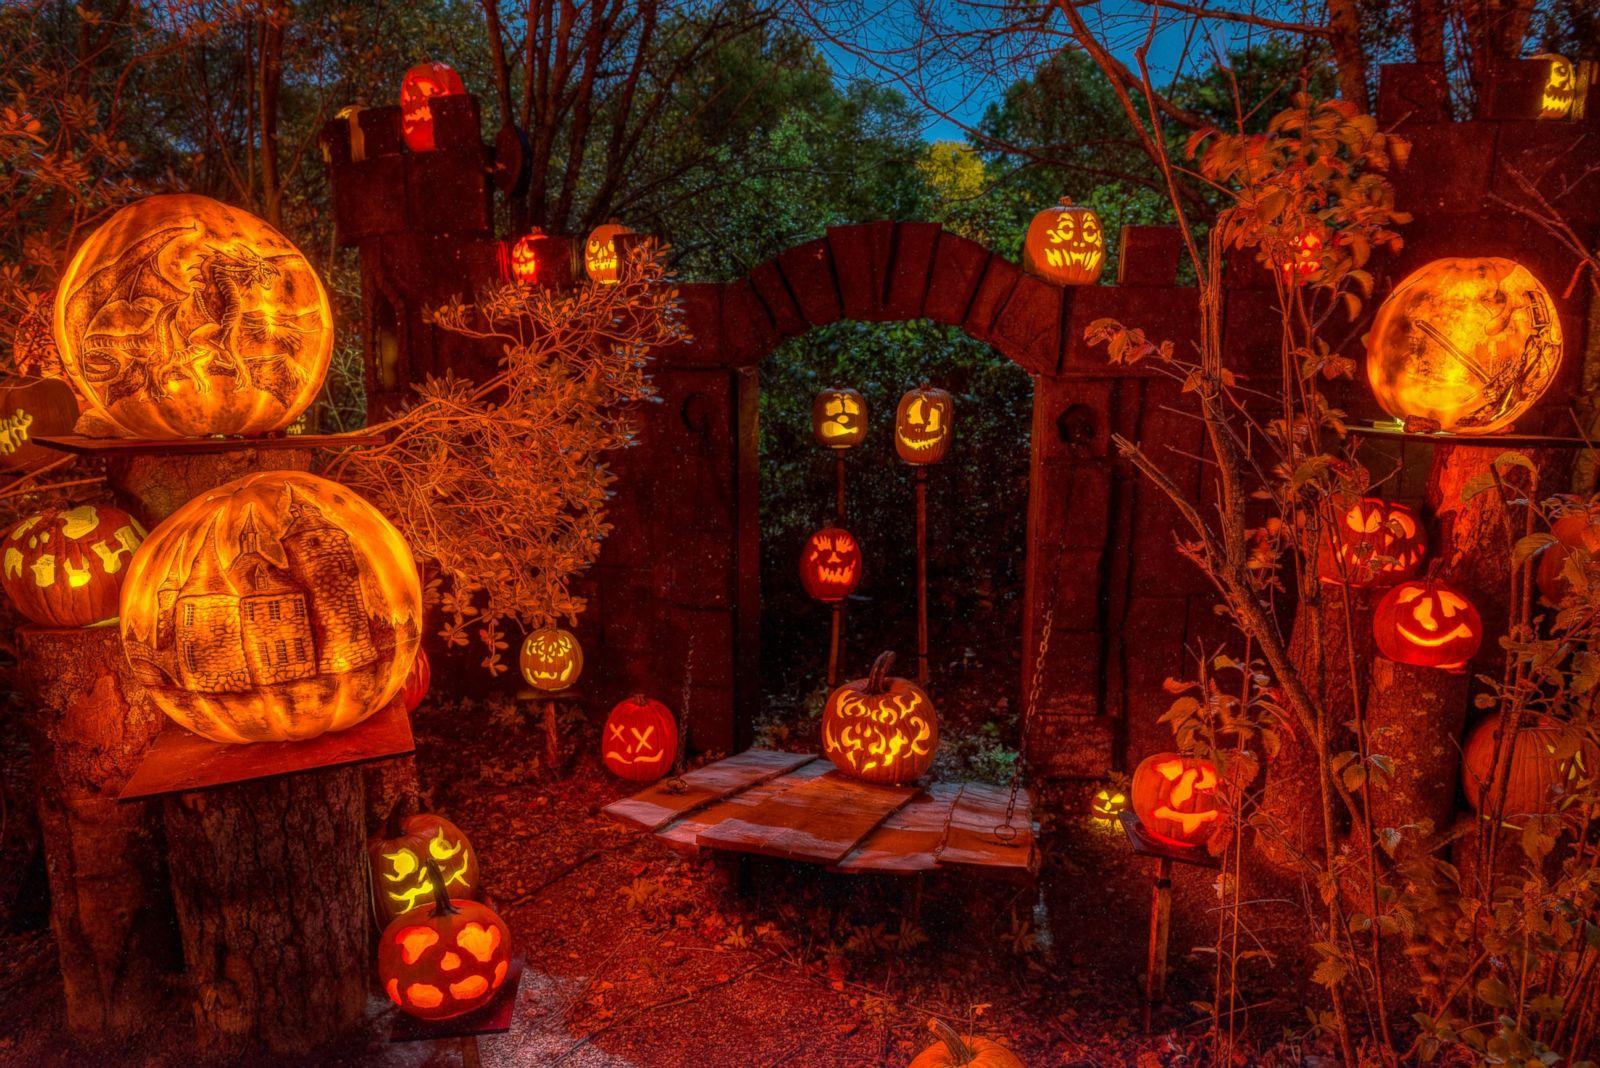 Halloween 2014: Amazing Pumpkin Carvings